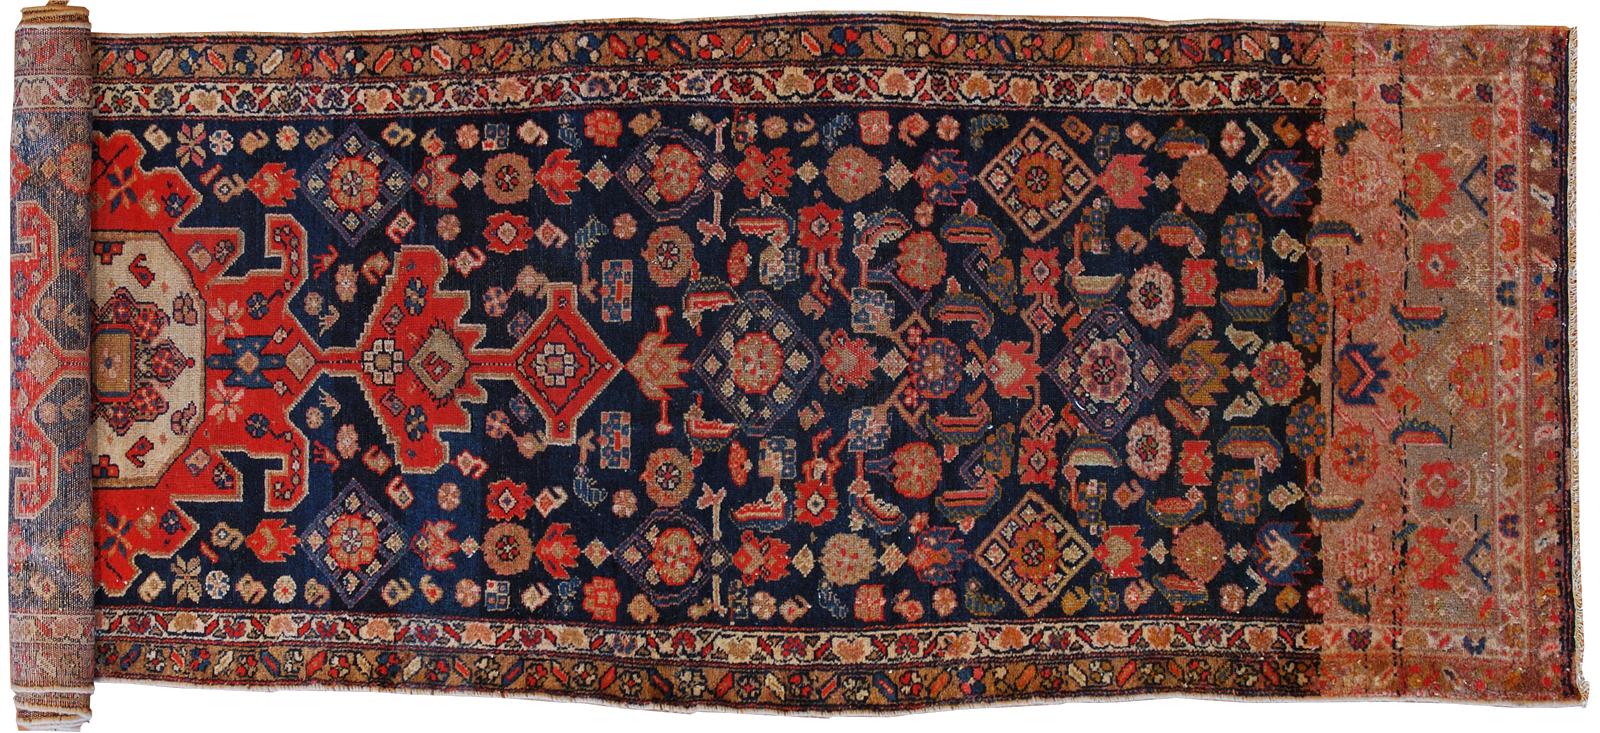 Tappeti Persiani Passatoie Prezzi – Idee immagine mobili